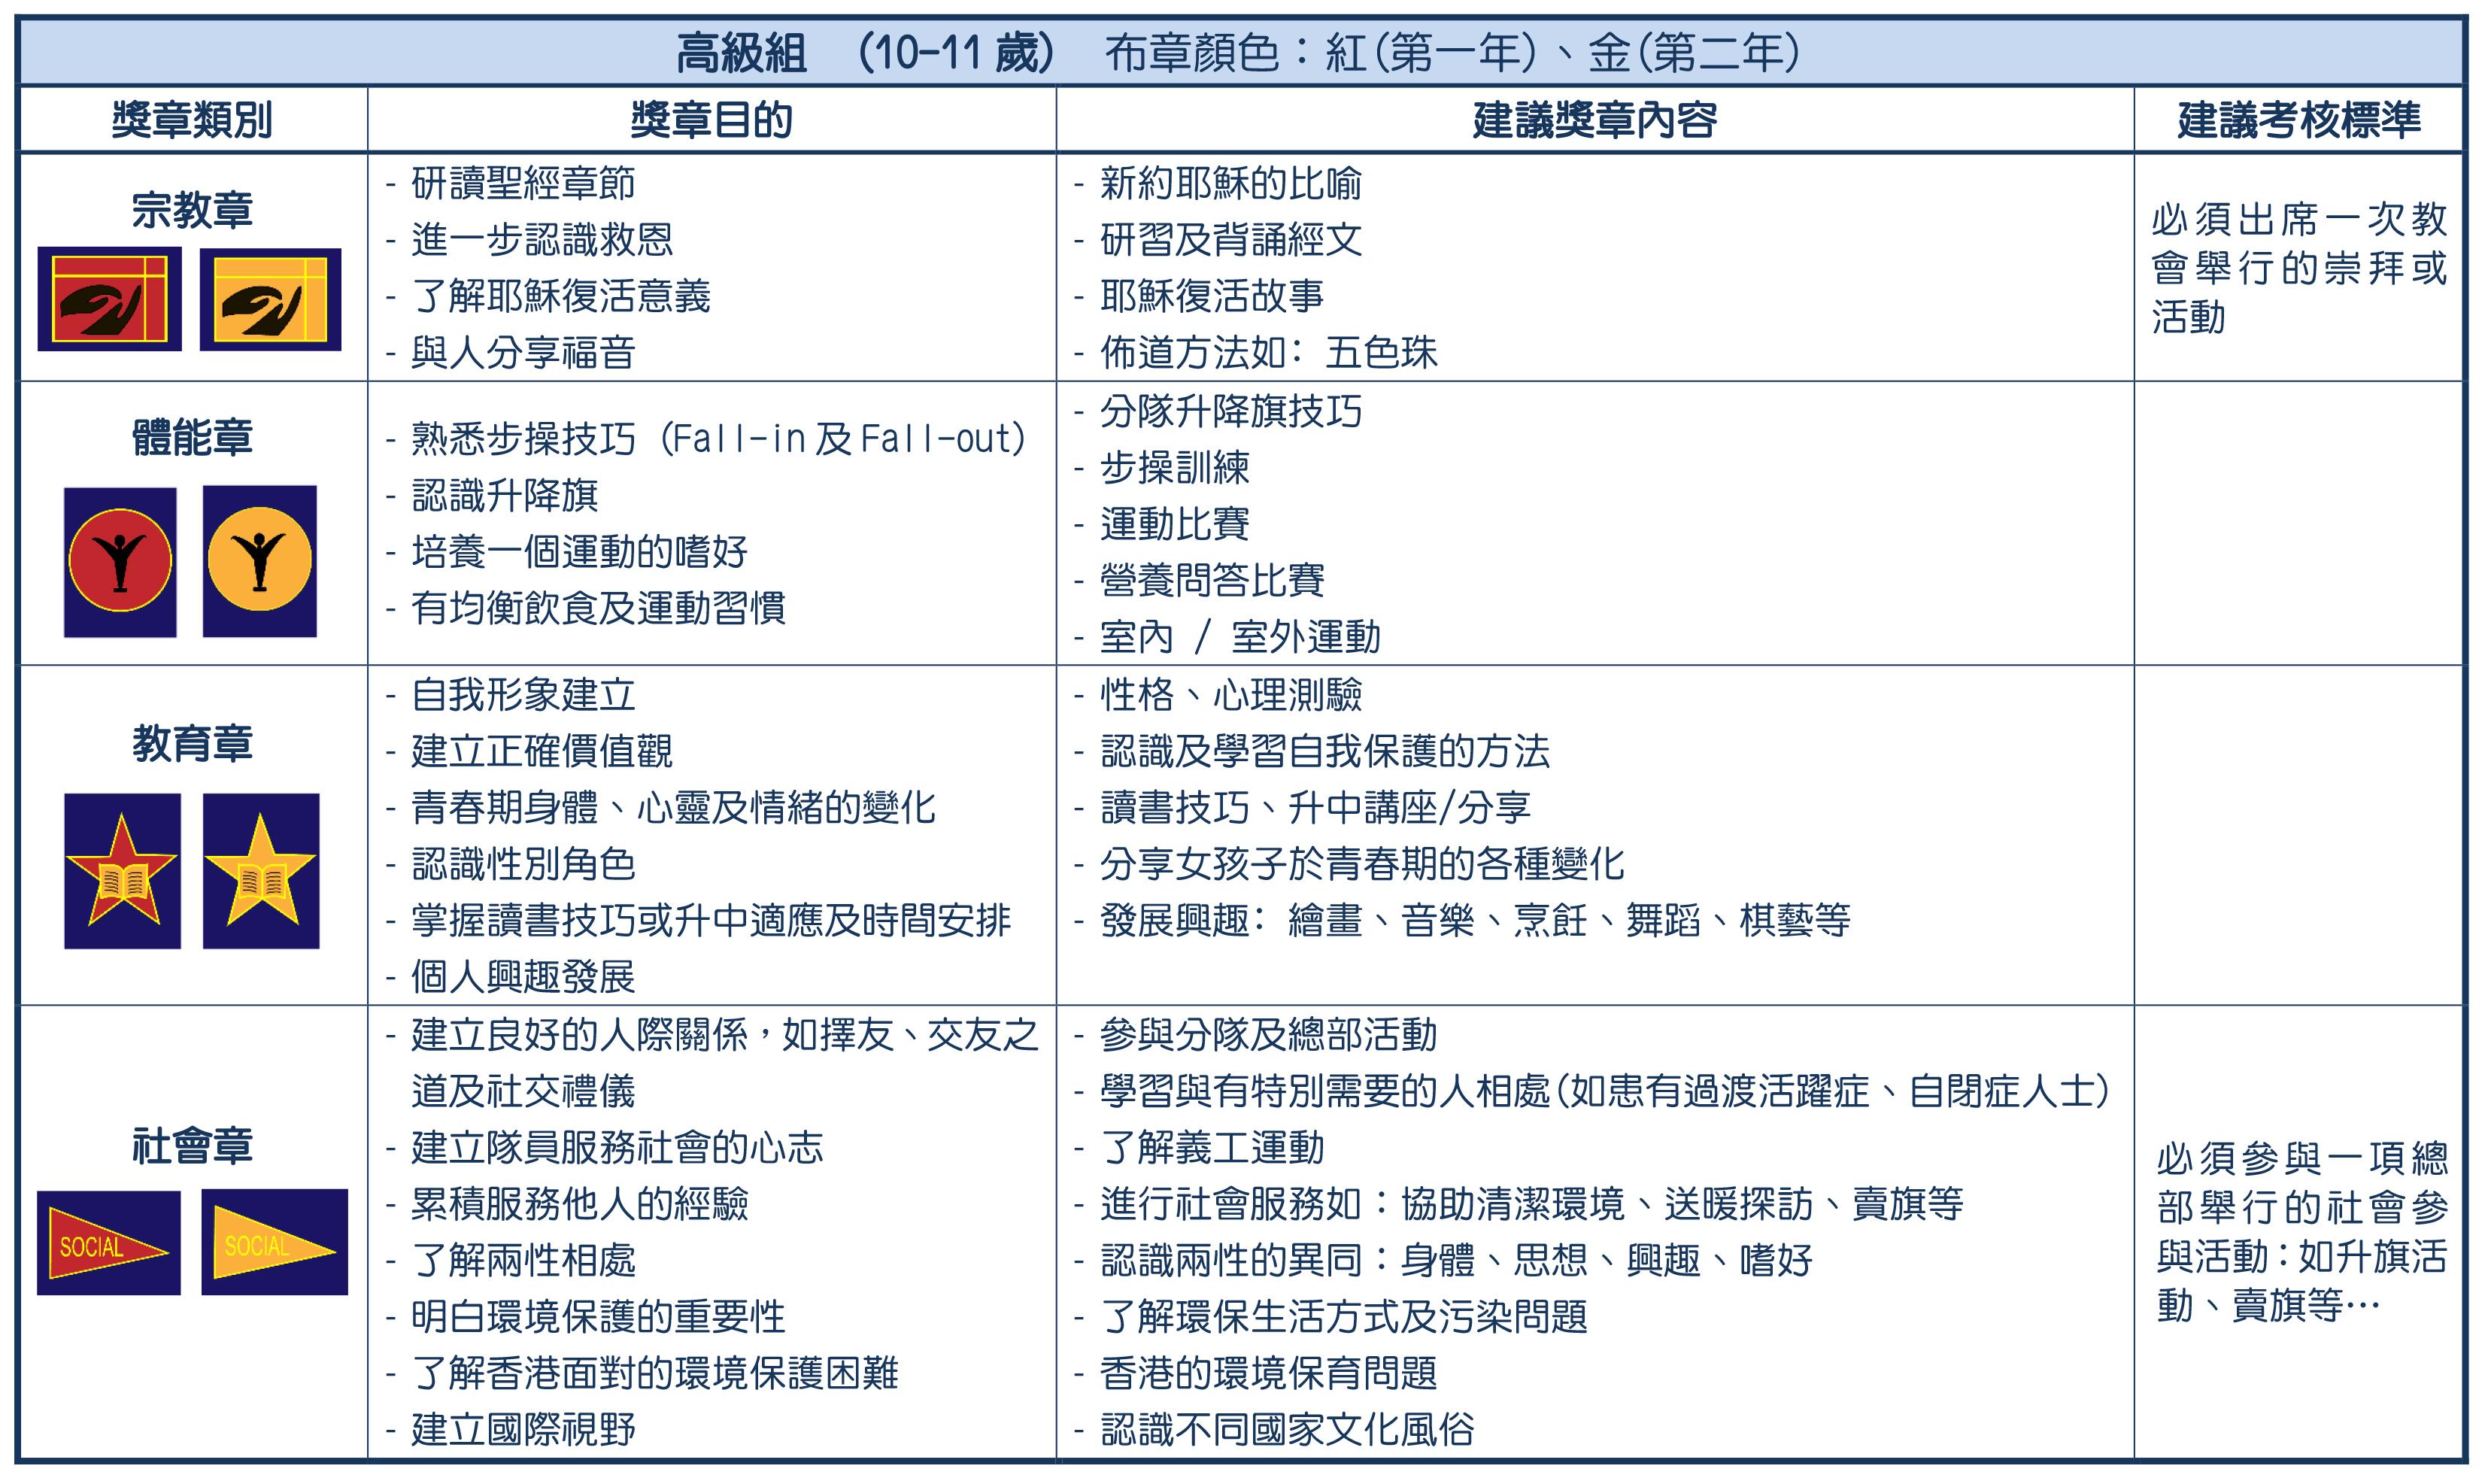 6- 獎章制度-高級組(revised 2020829)